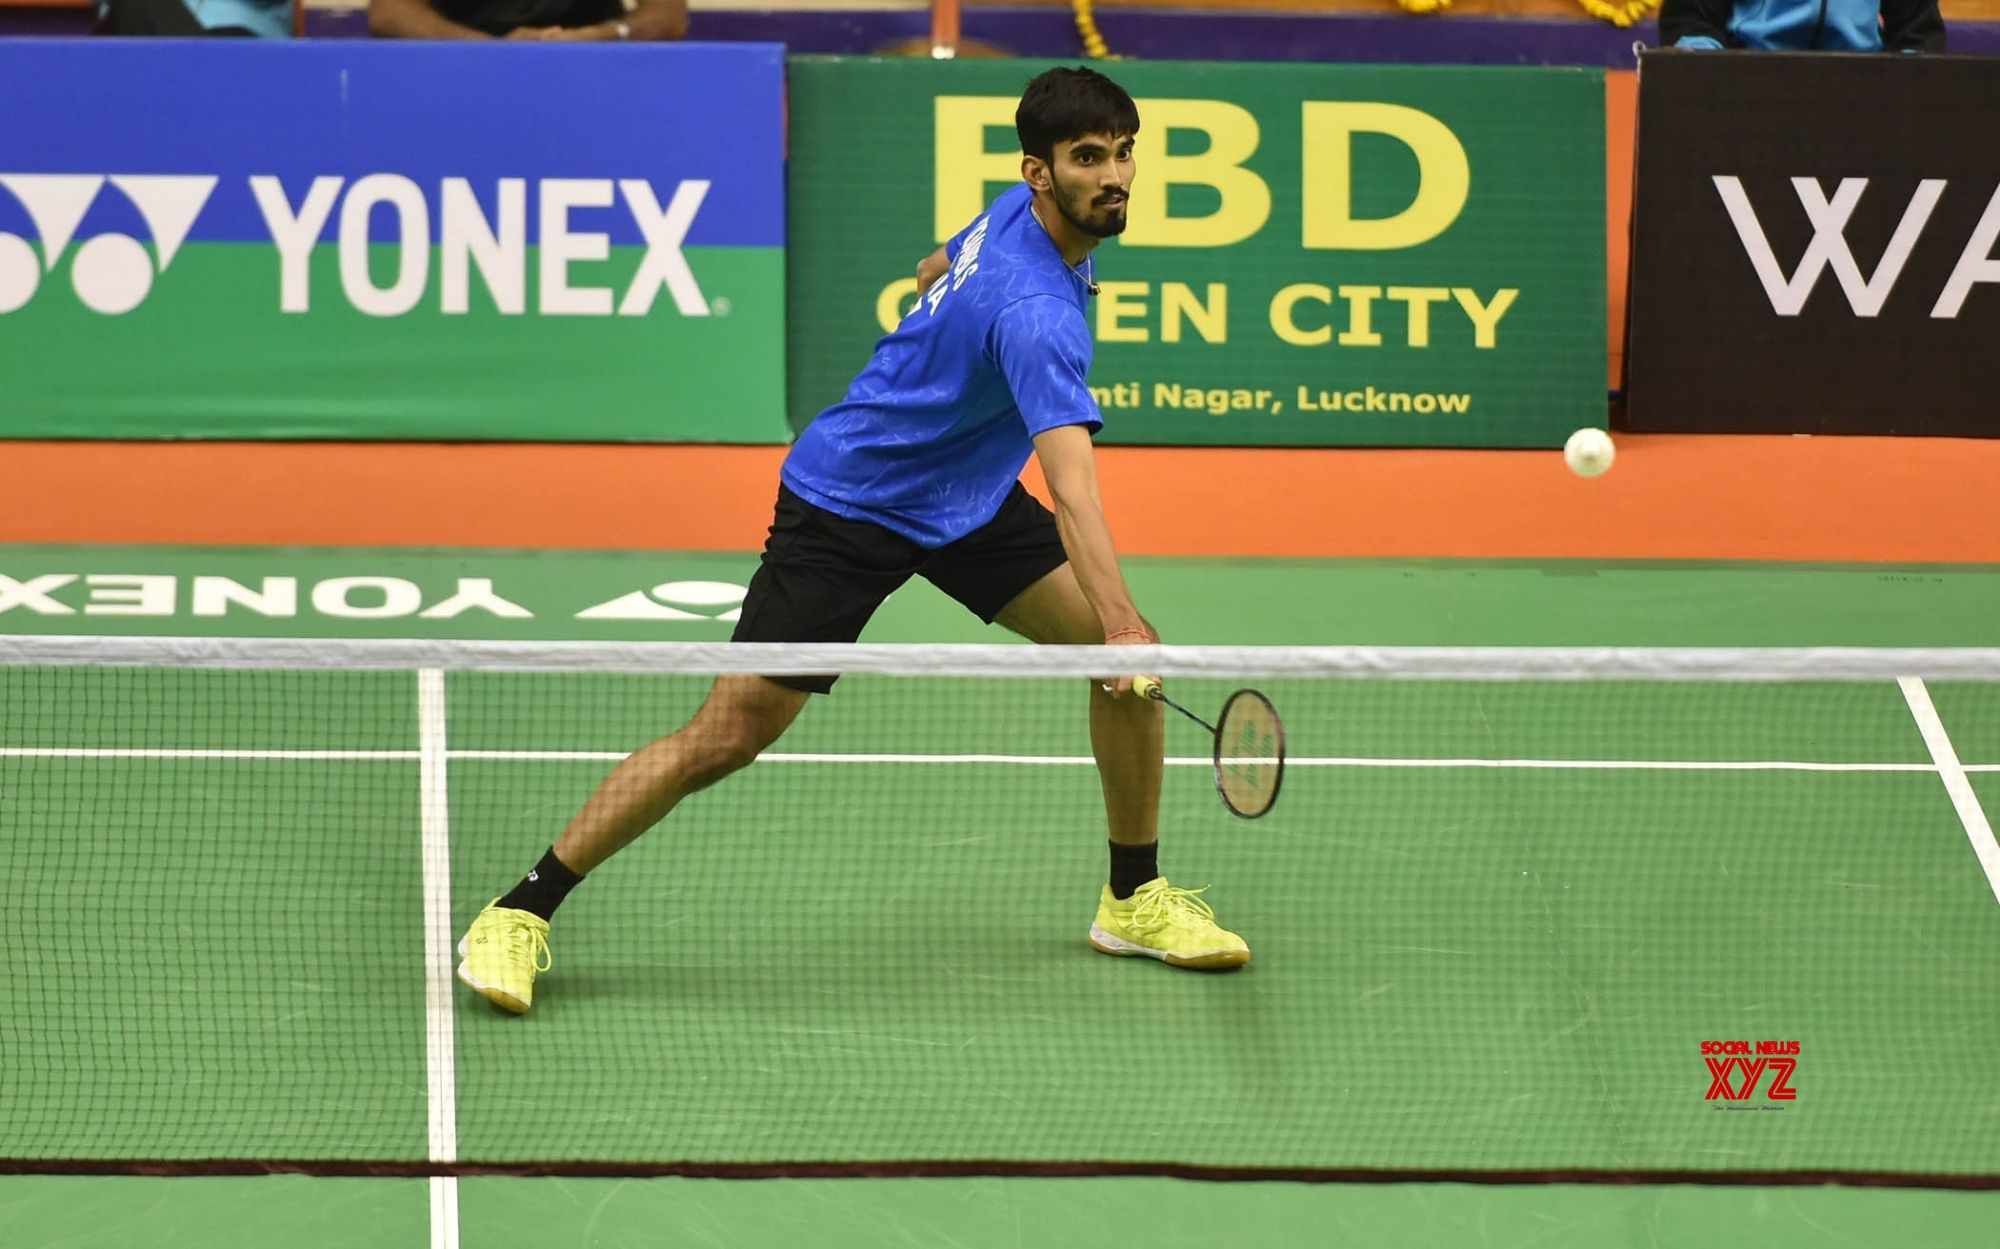 Premier Badminton League Season 5 to start on Jan 20